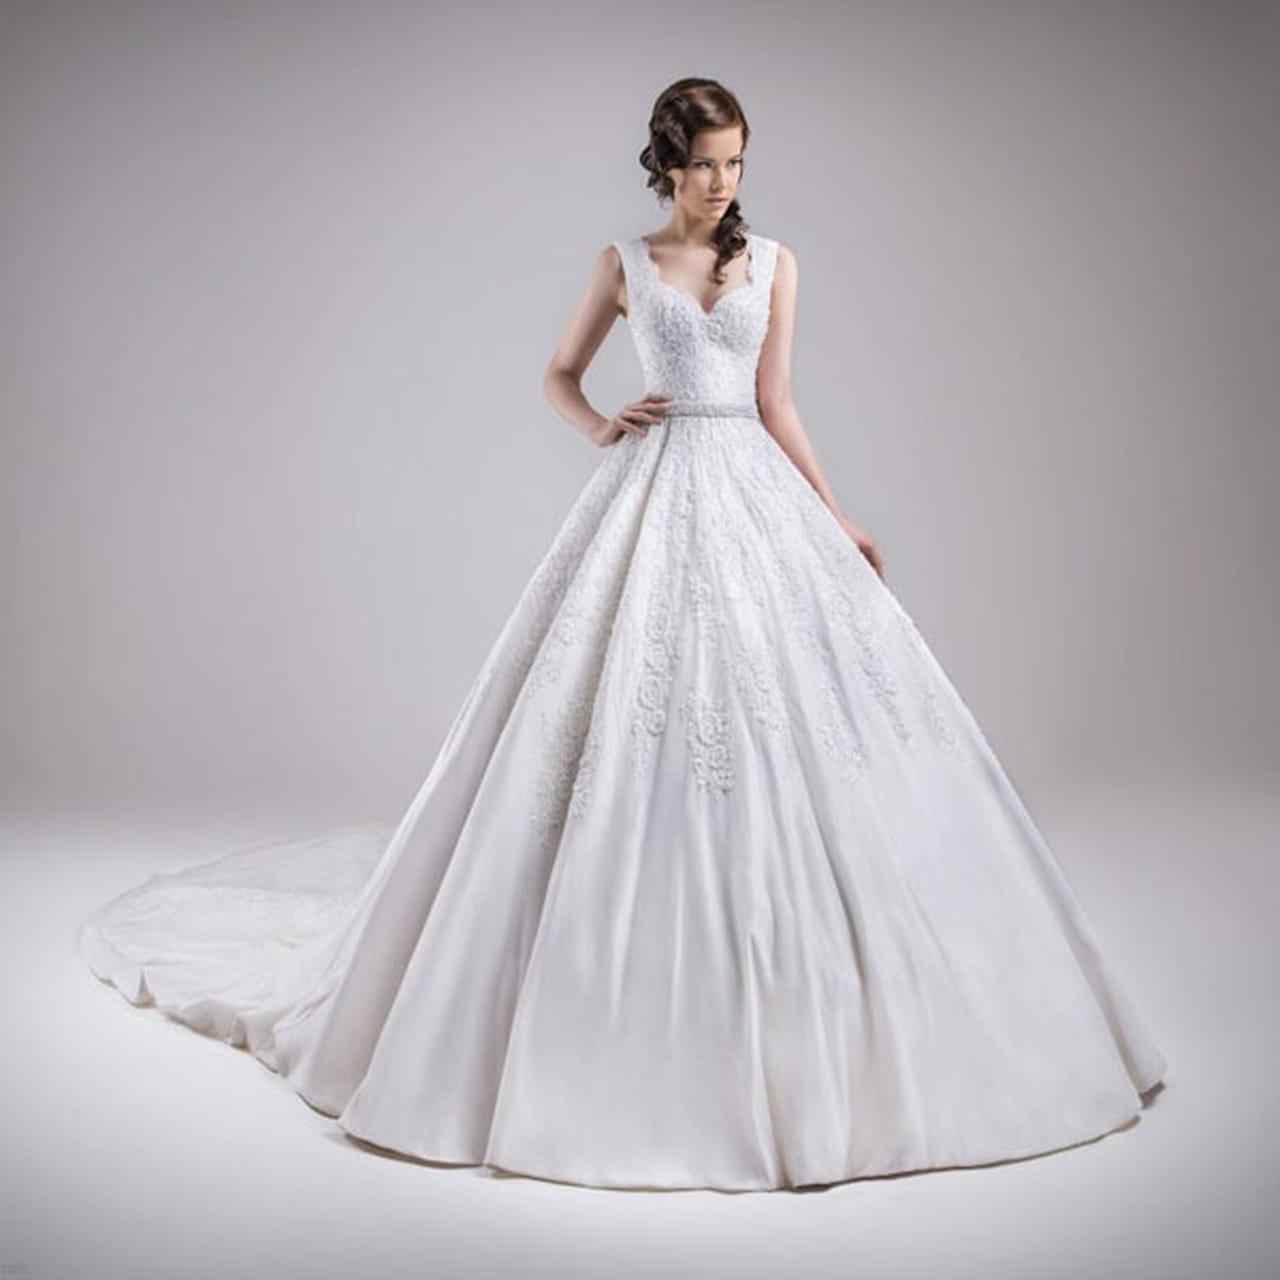 9e4393e1b9855 فساتين زفاف منفوشة 2015 للمصممة كريستل عطاالله